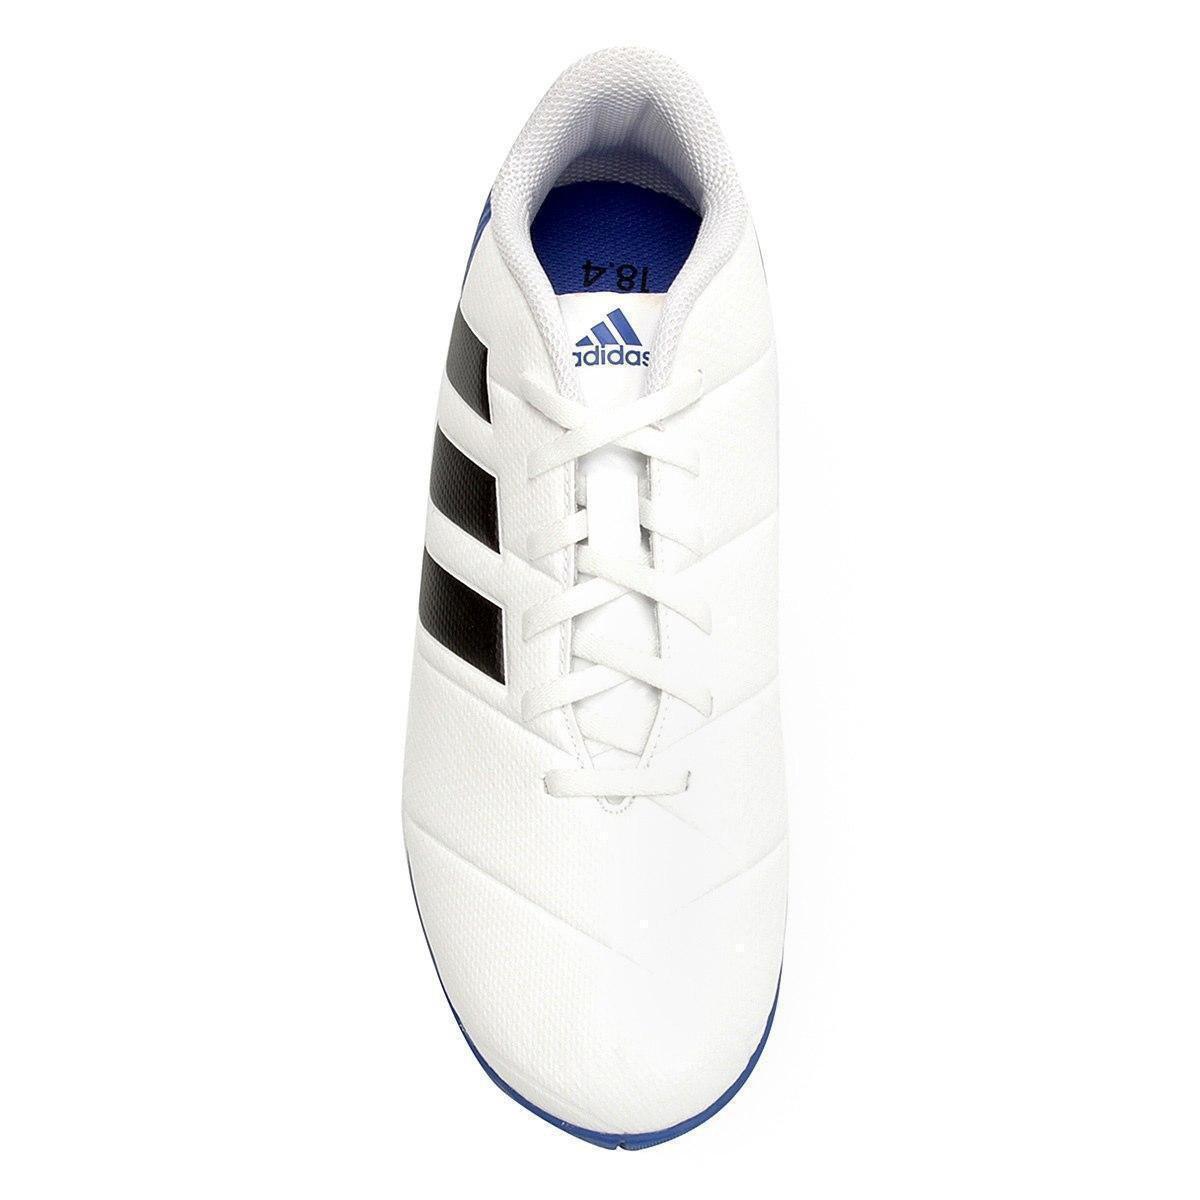 bd0da2b4ef Chuteira Futsal Adidas Nemeziz Messi Tan 18 4 IN